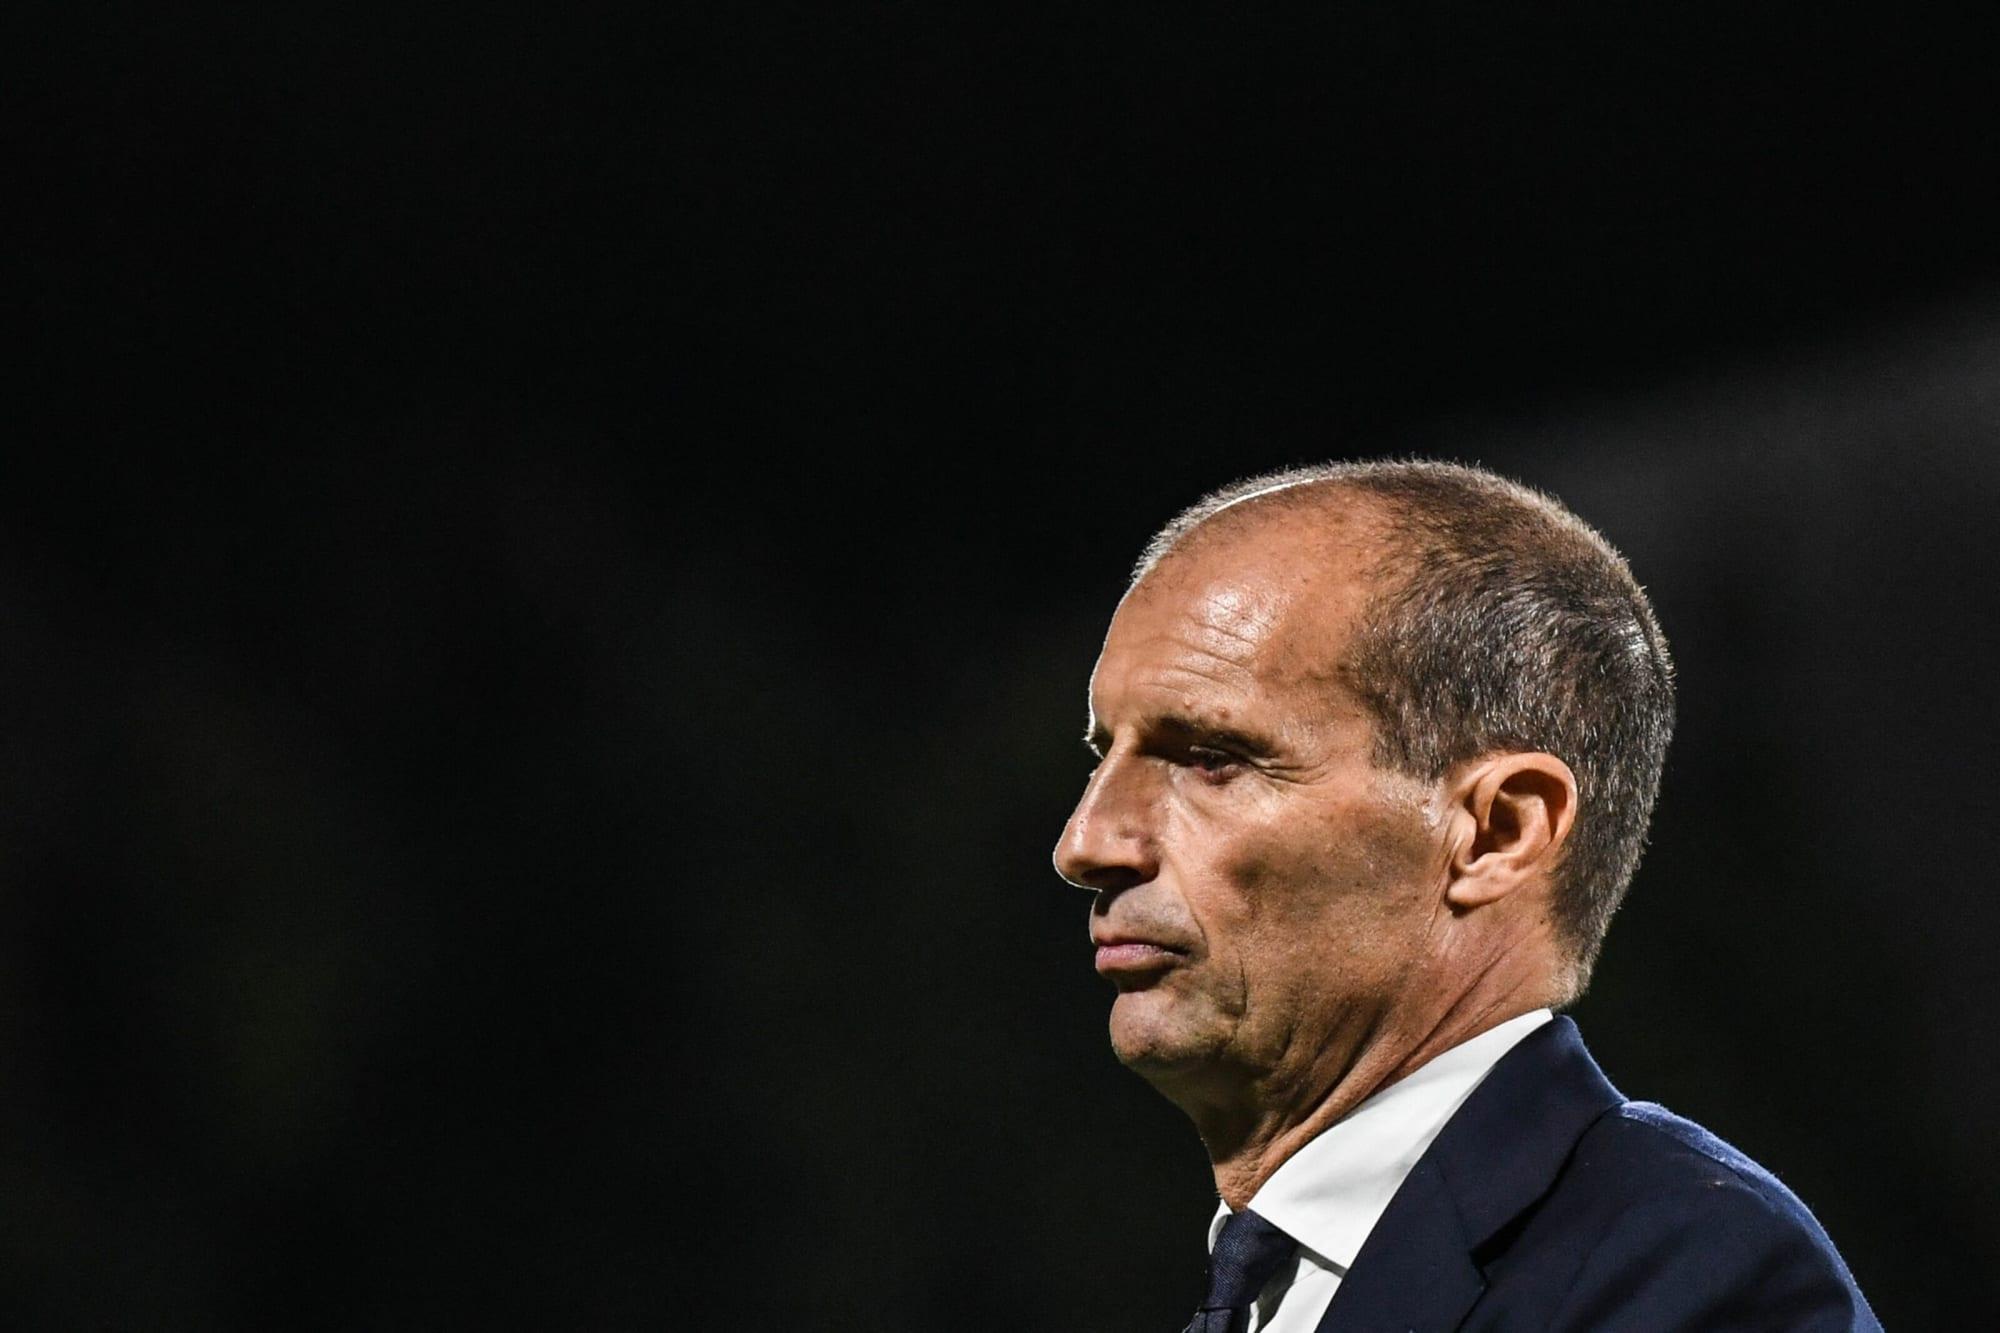 Juventus must find their identity under Massimiliano Allegri